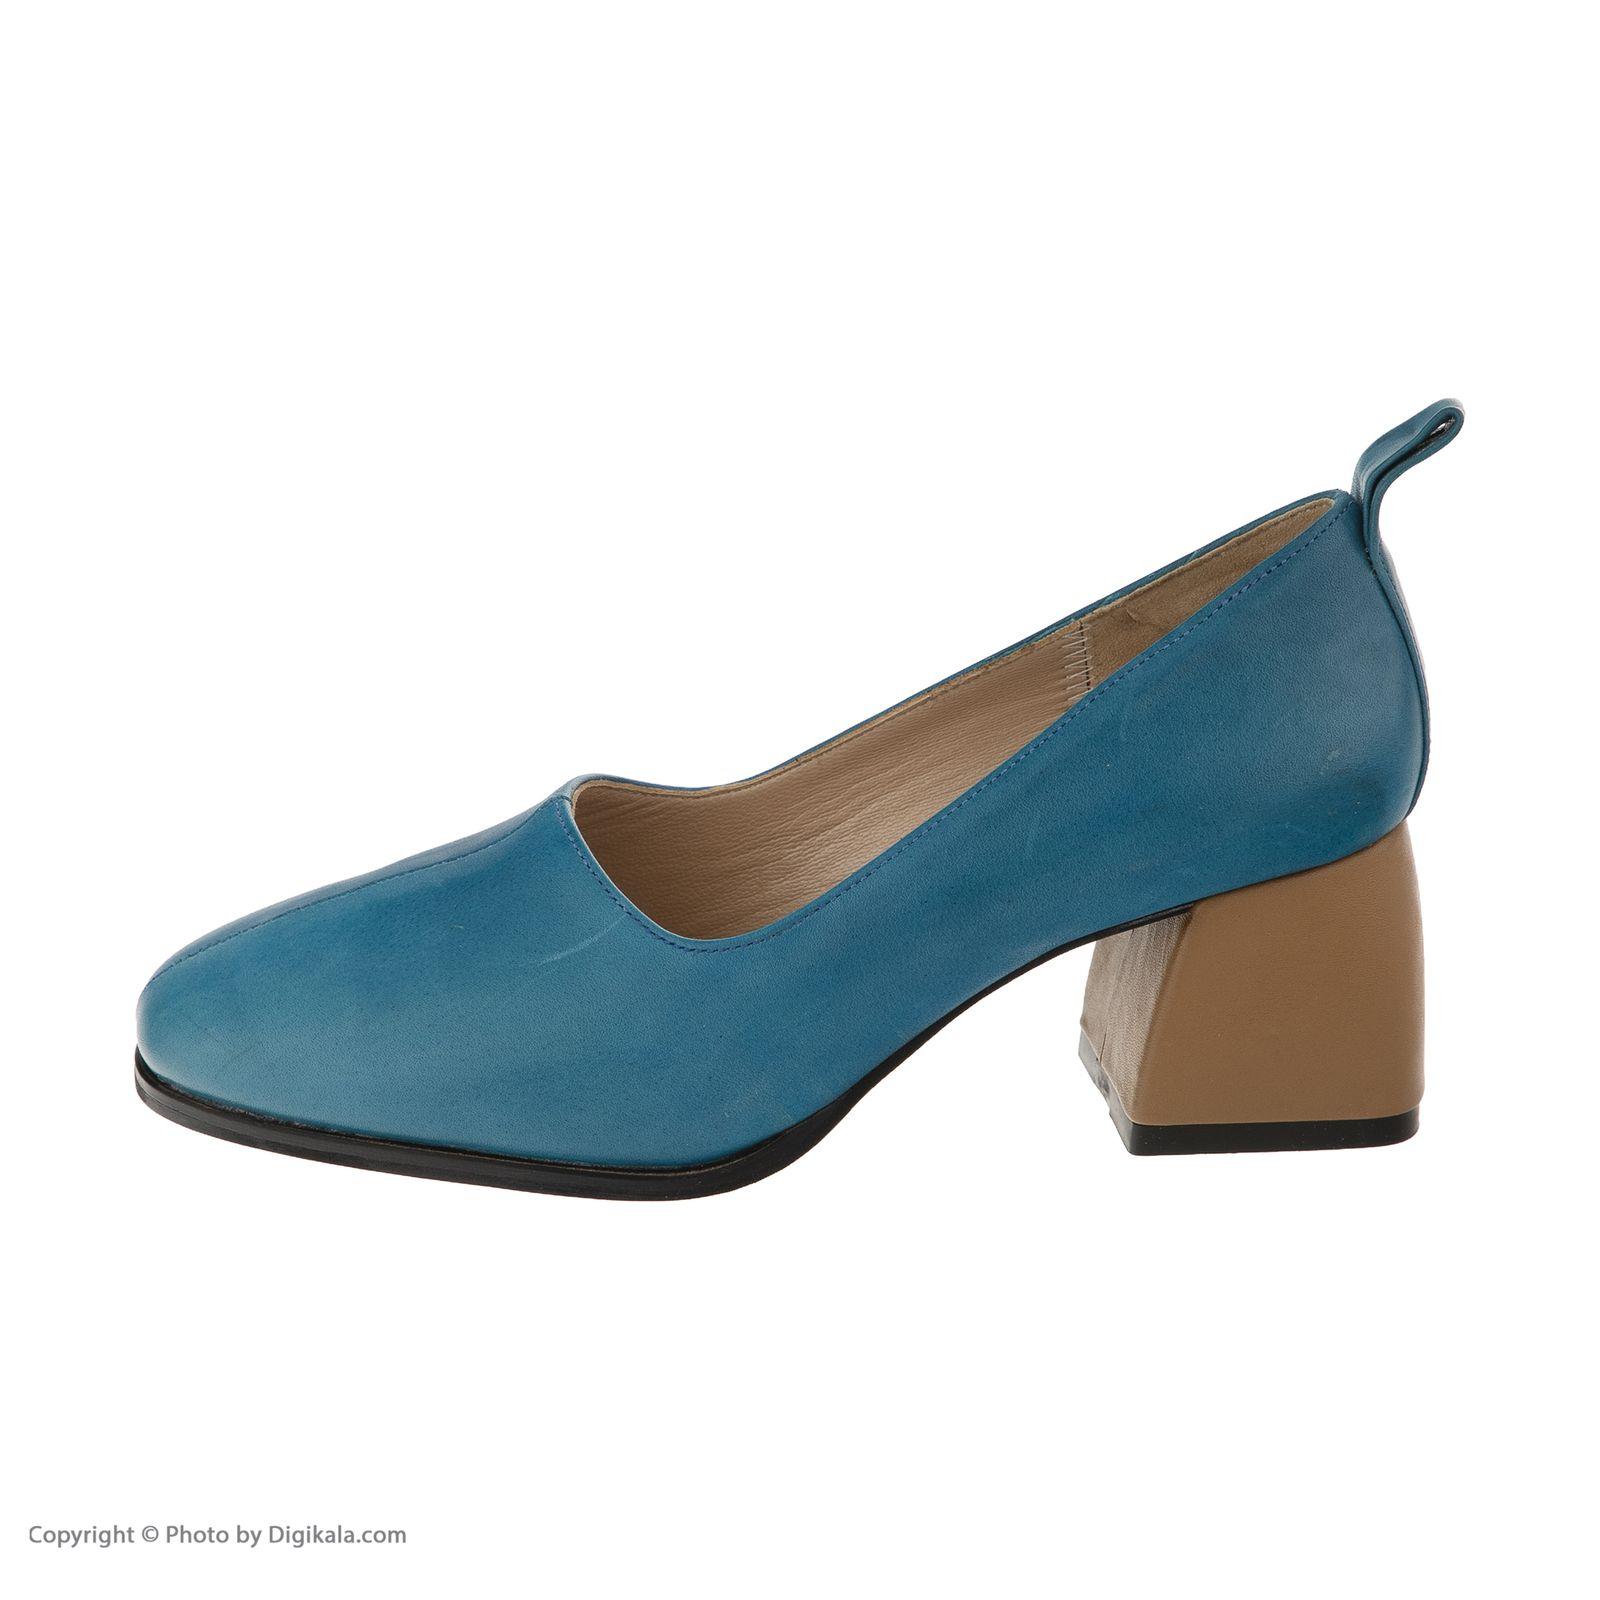 کفش زنانه آرتمن مدل leroy-42694-158 -  - 3